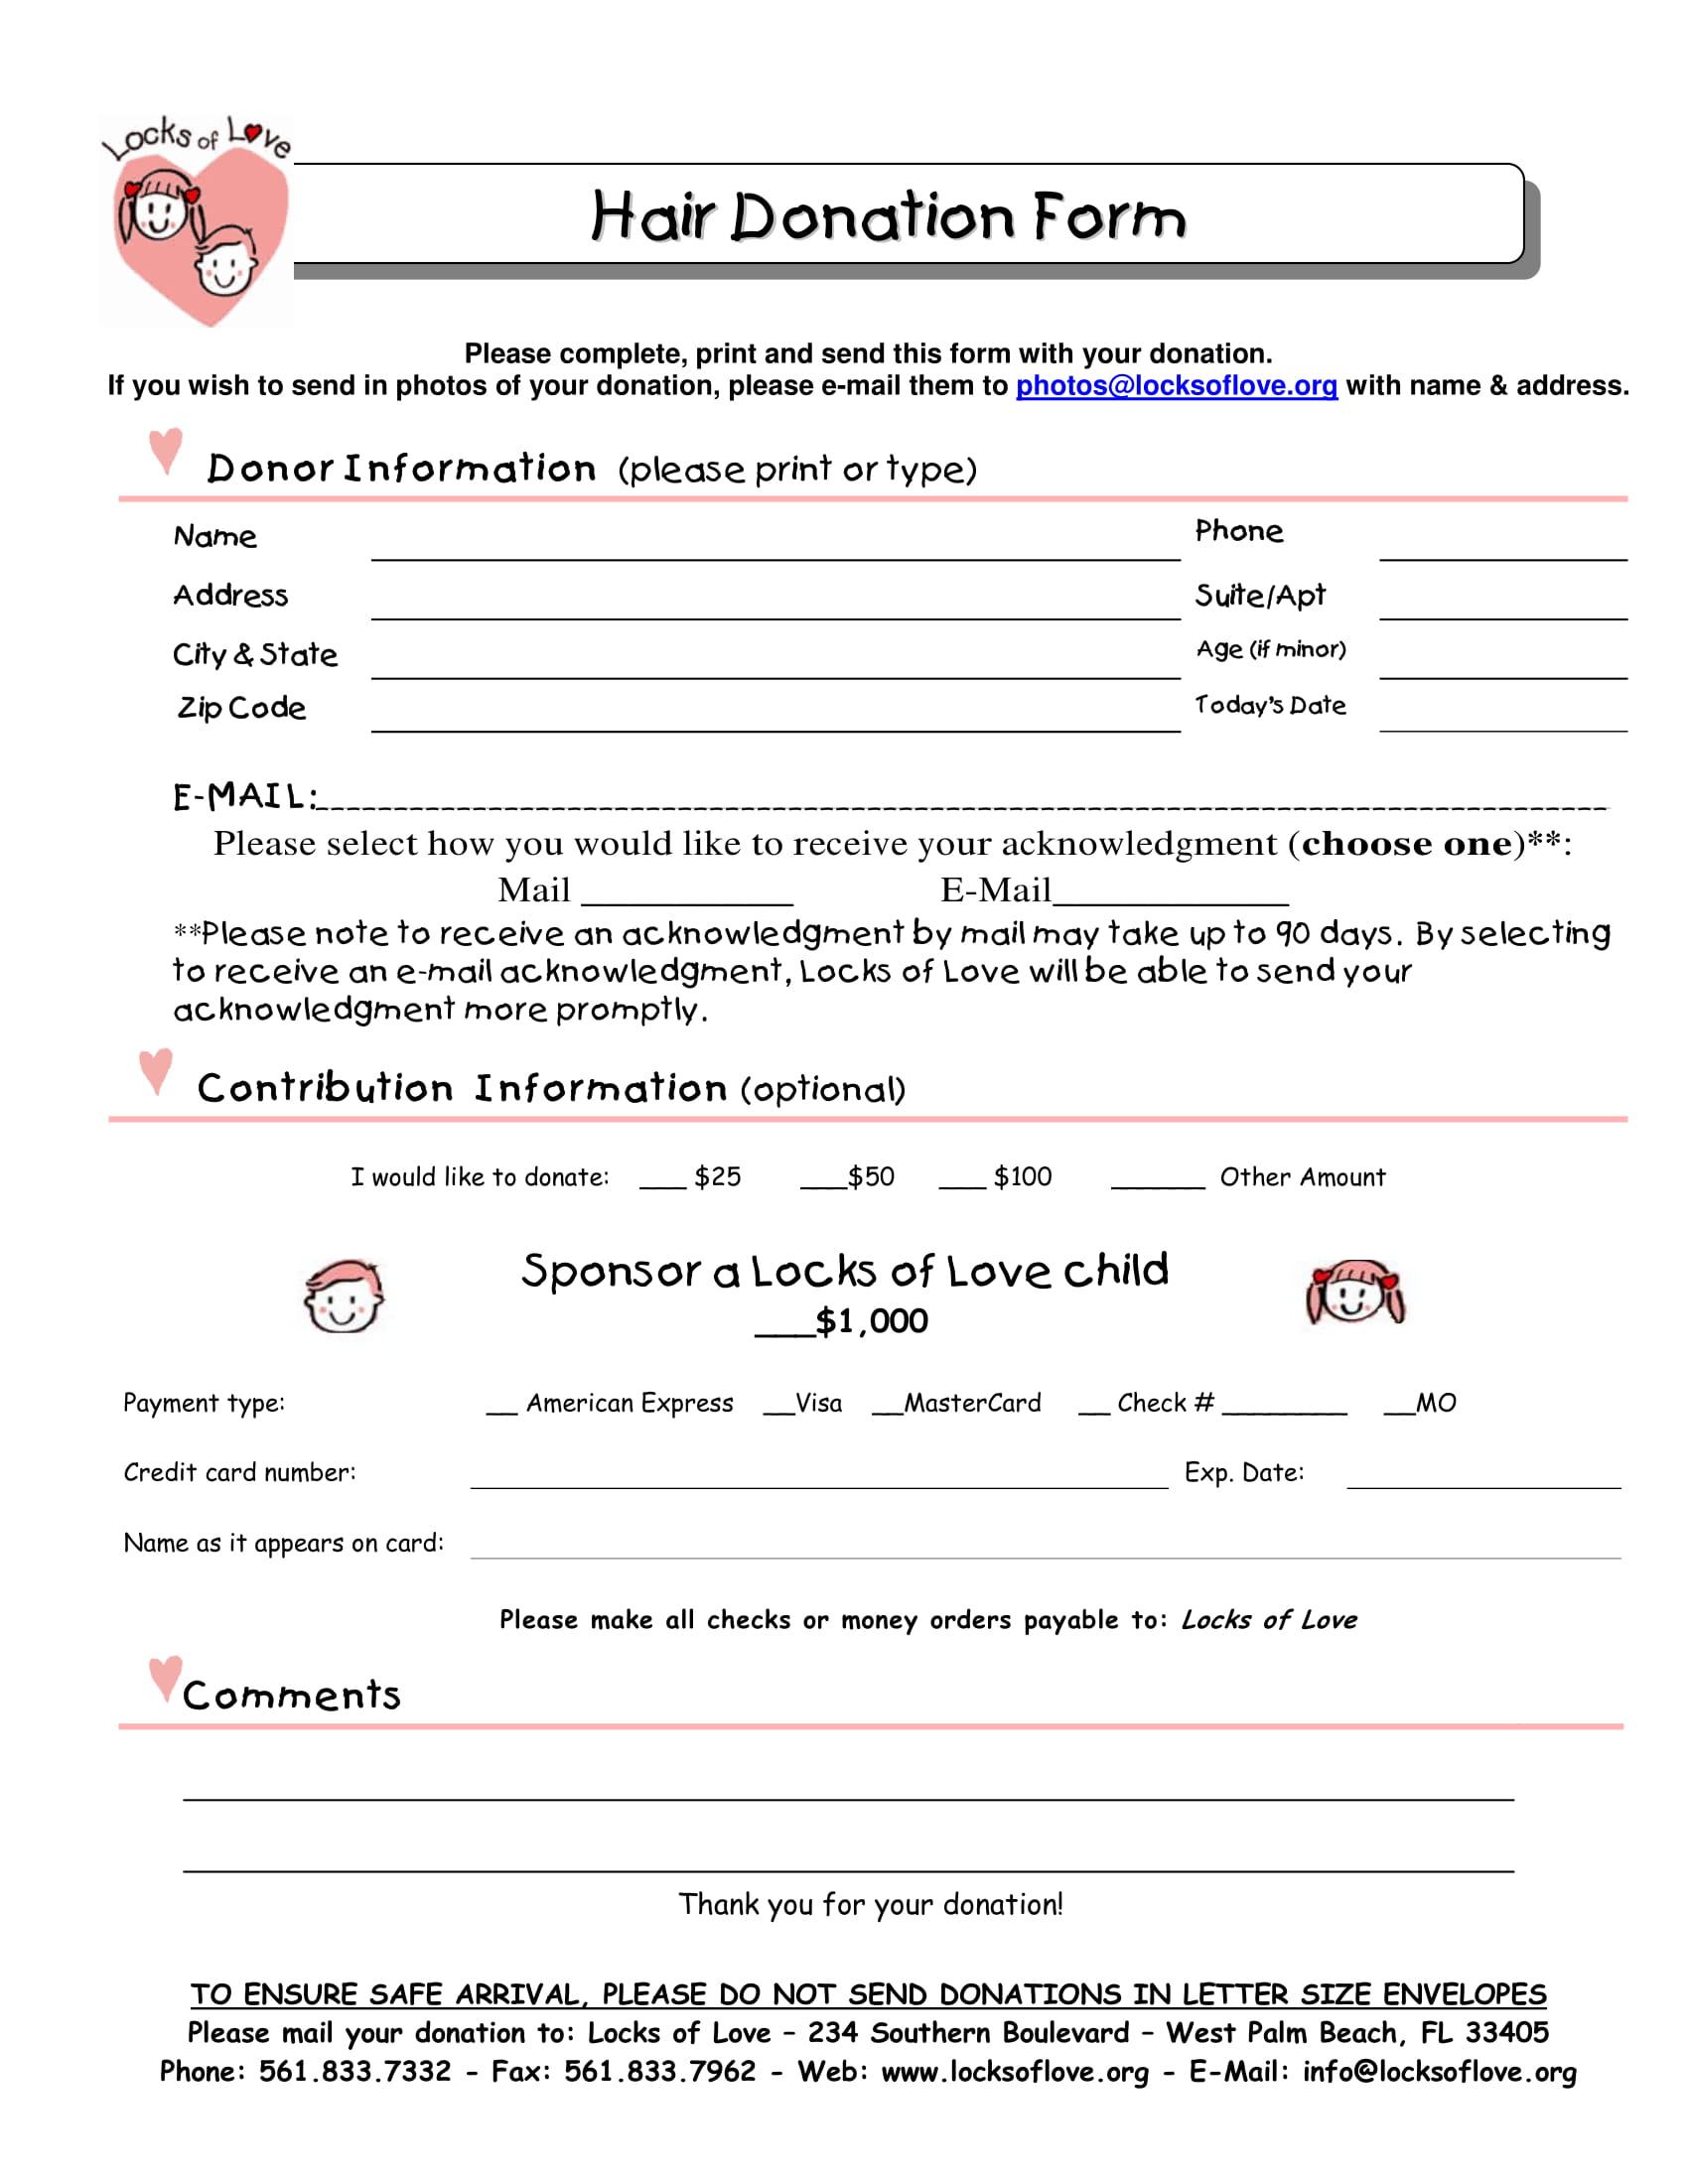 hair donation form 1